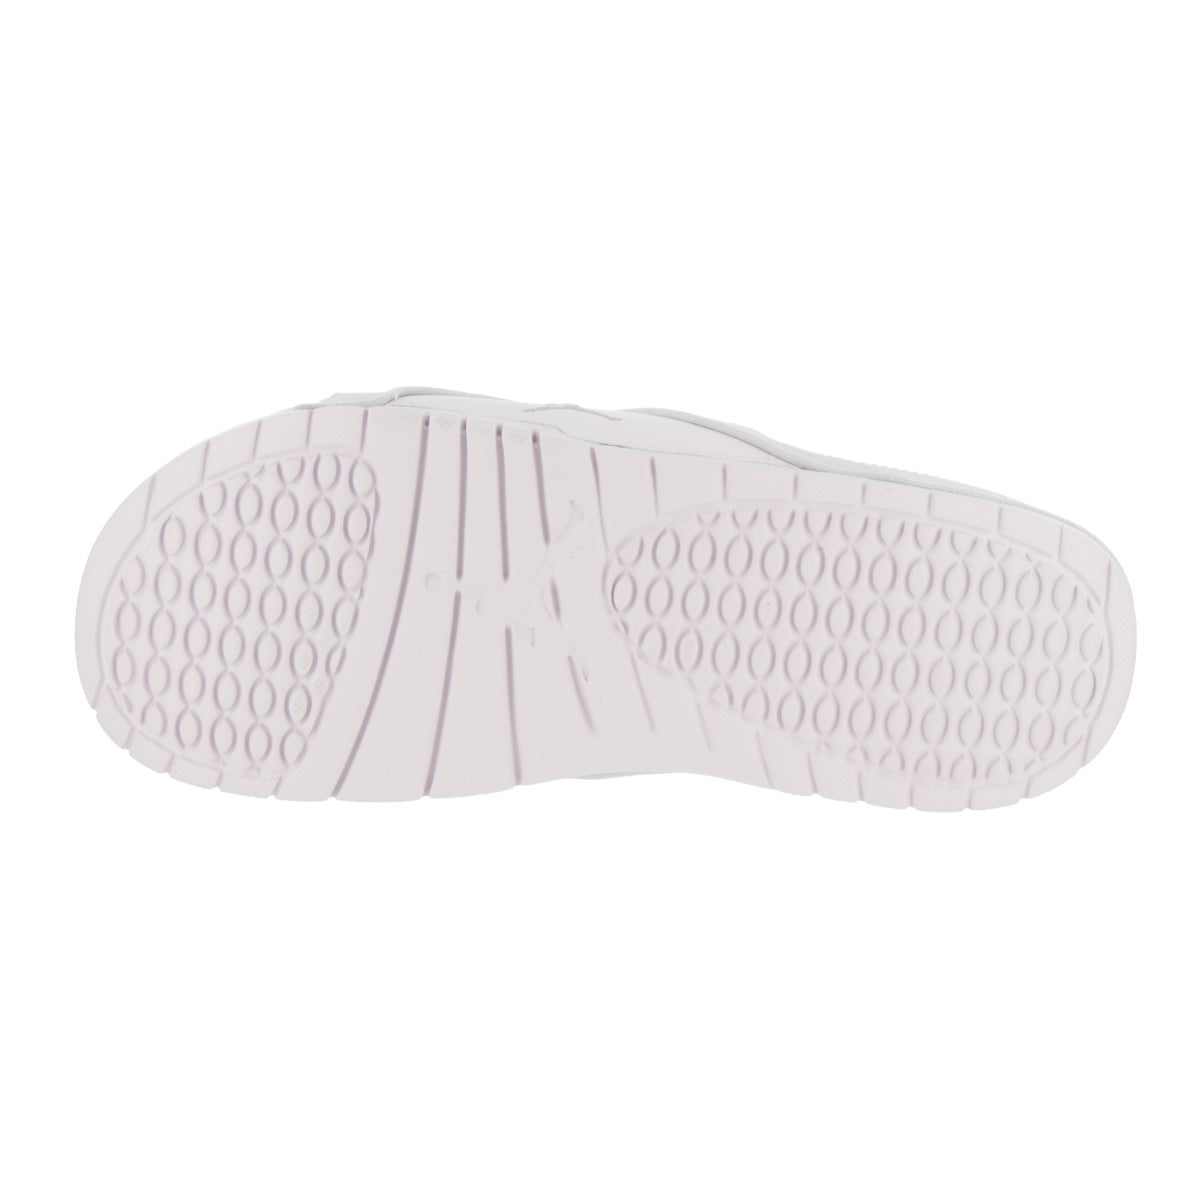 4b7aad60e2ee29 Shop Nike Men s Jordan Hydro IV Retro Sandal - Free Shipping Today -  Overstock - 15858445